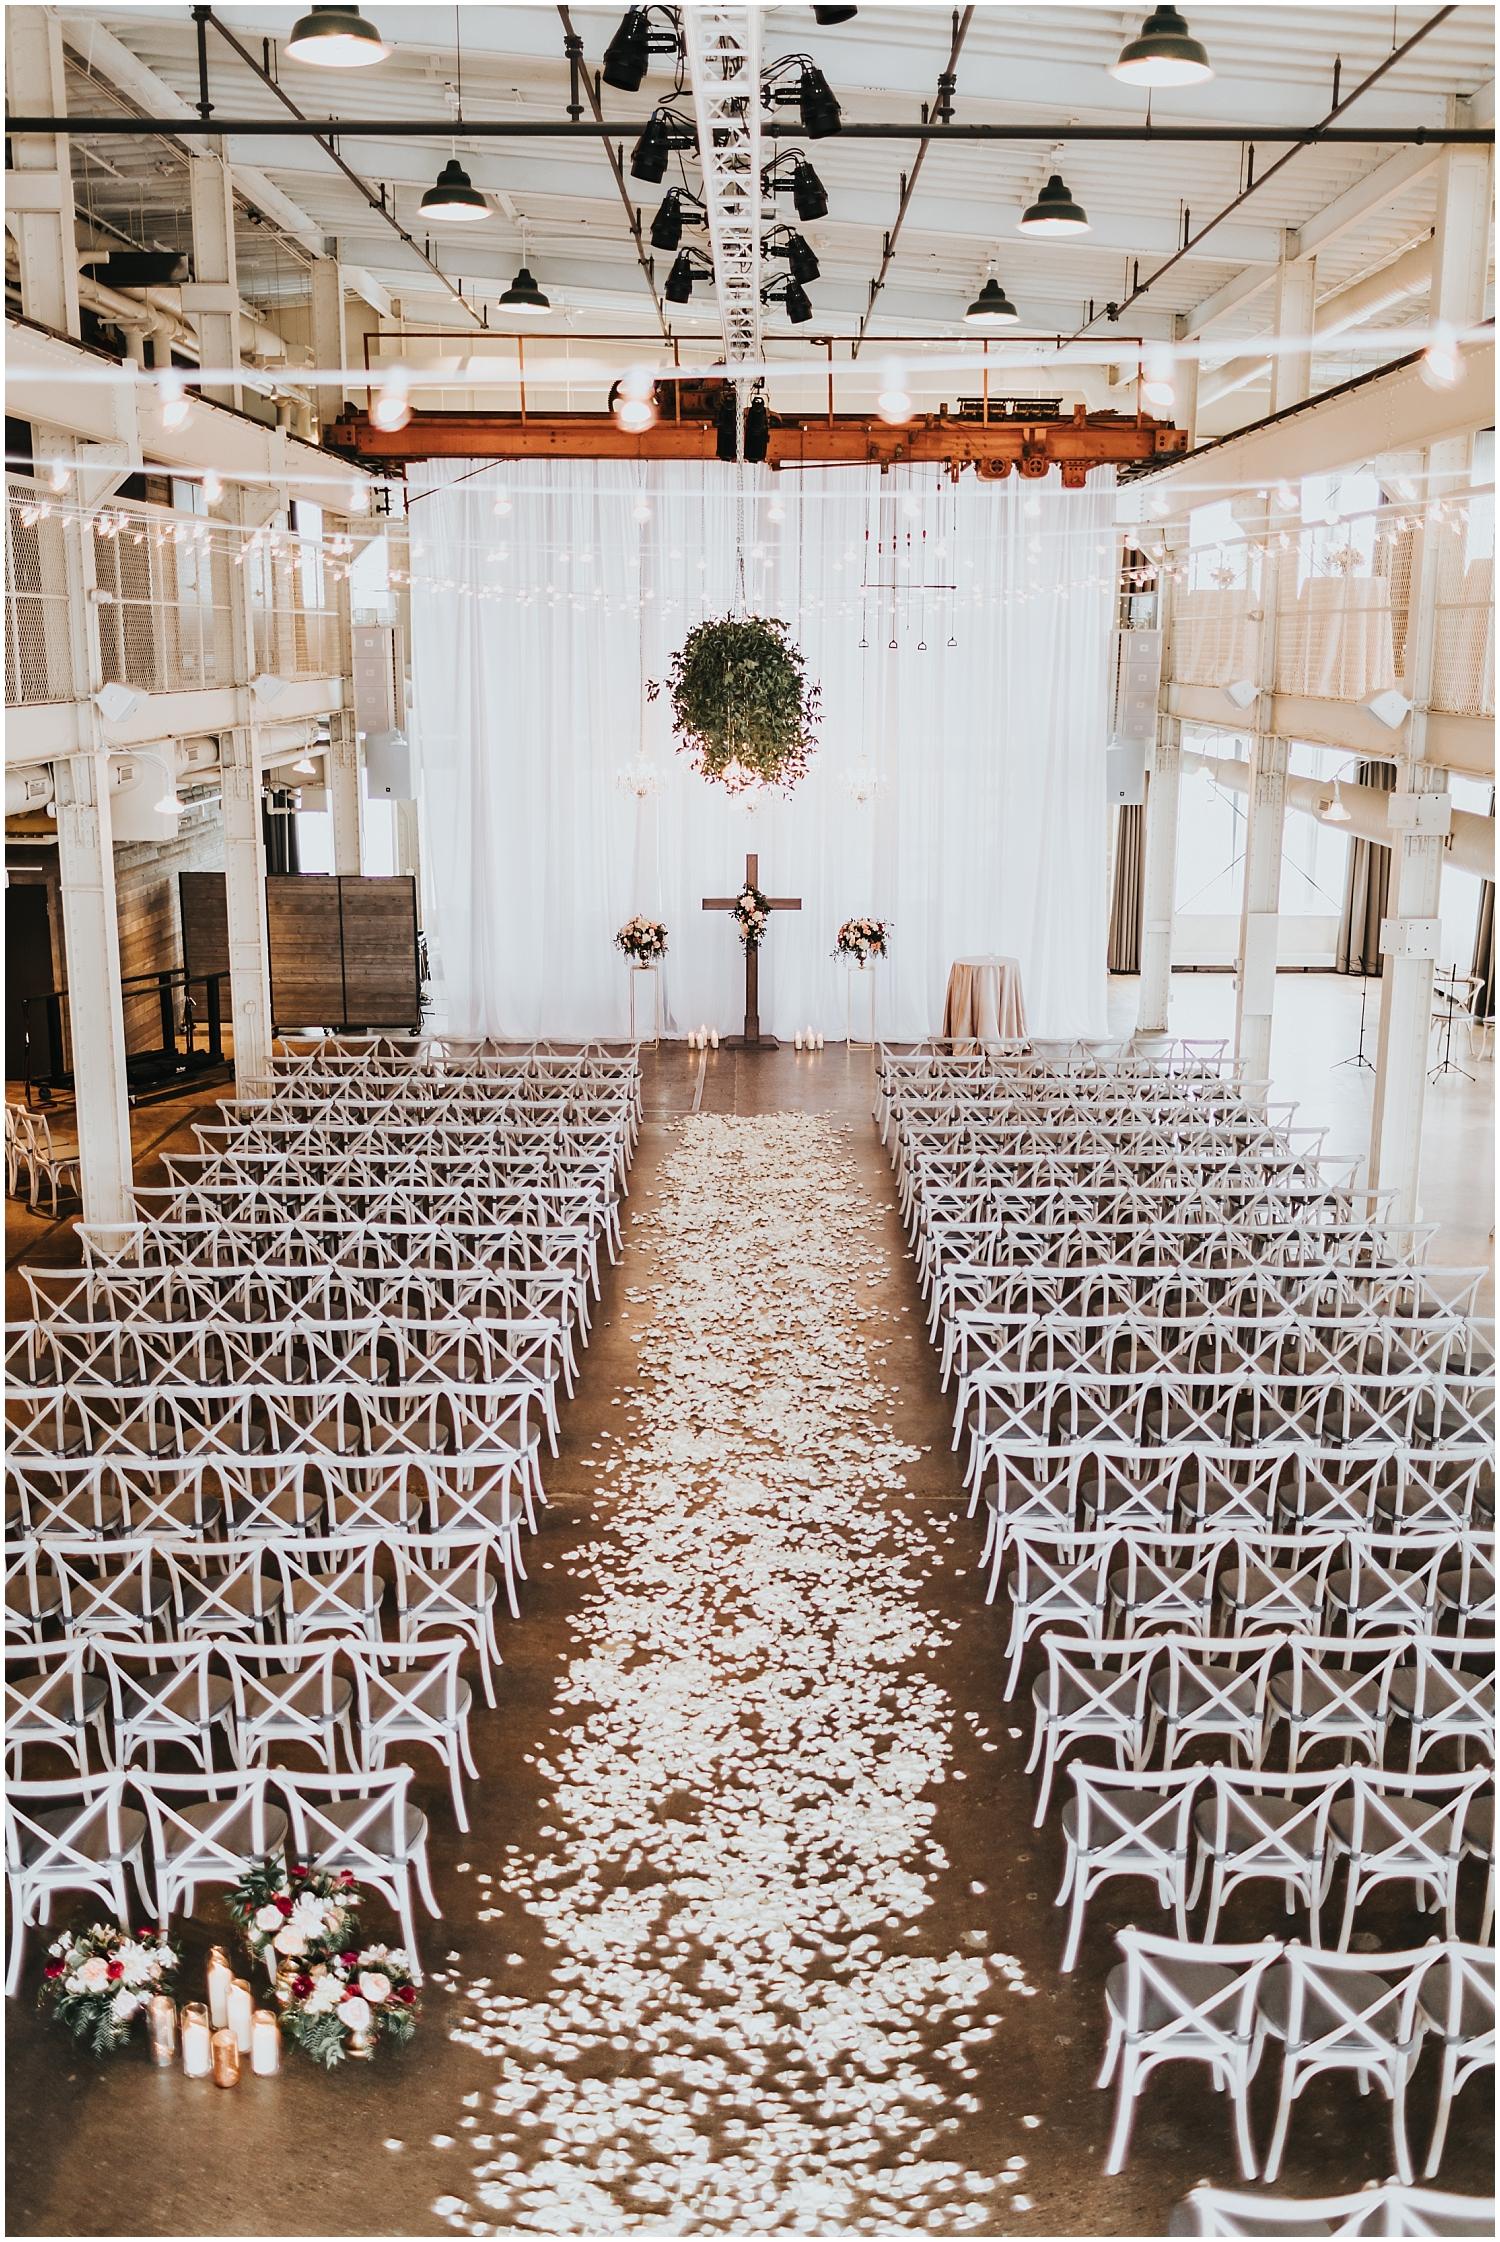 The Machine Shop Wedding Ceremony